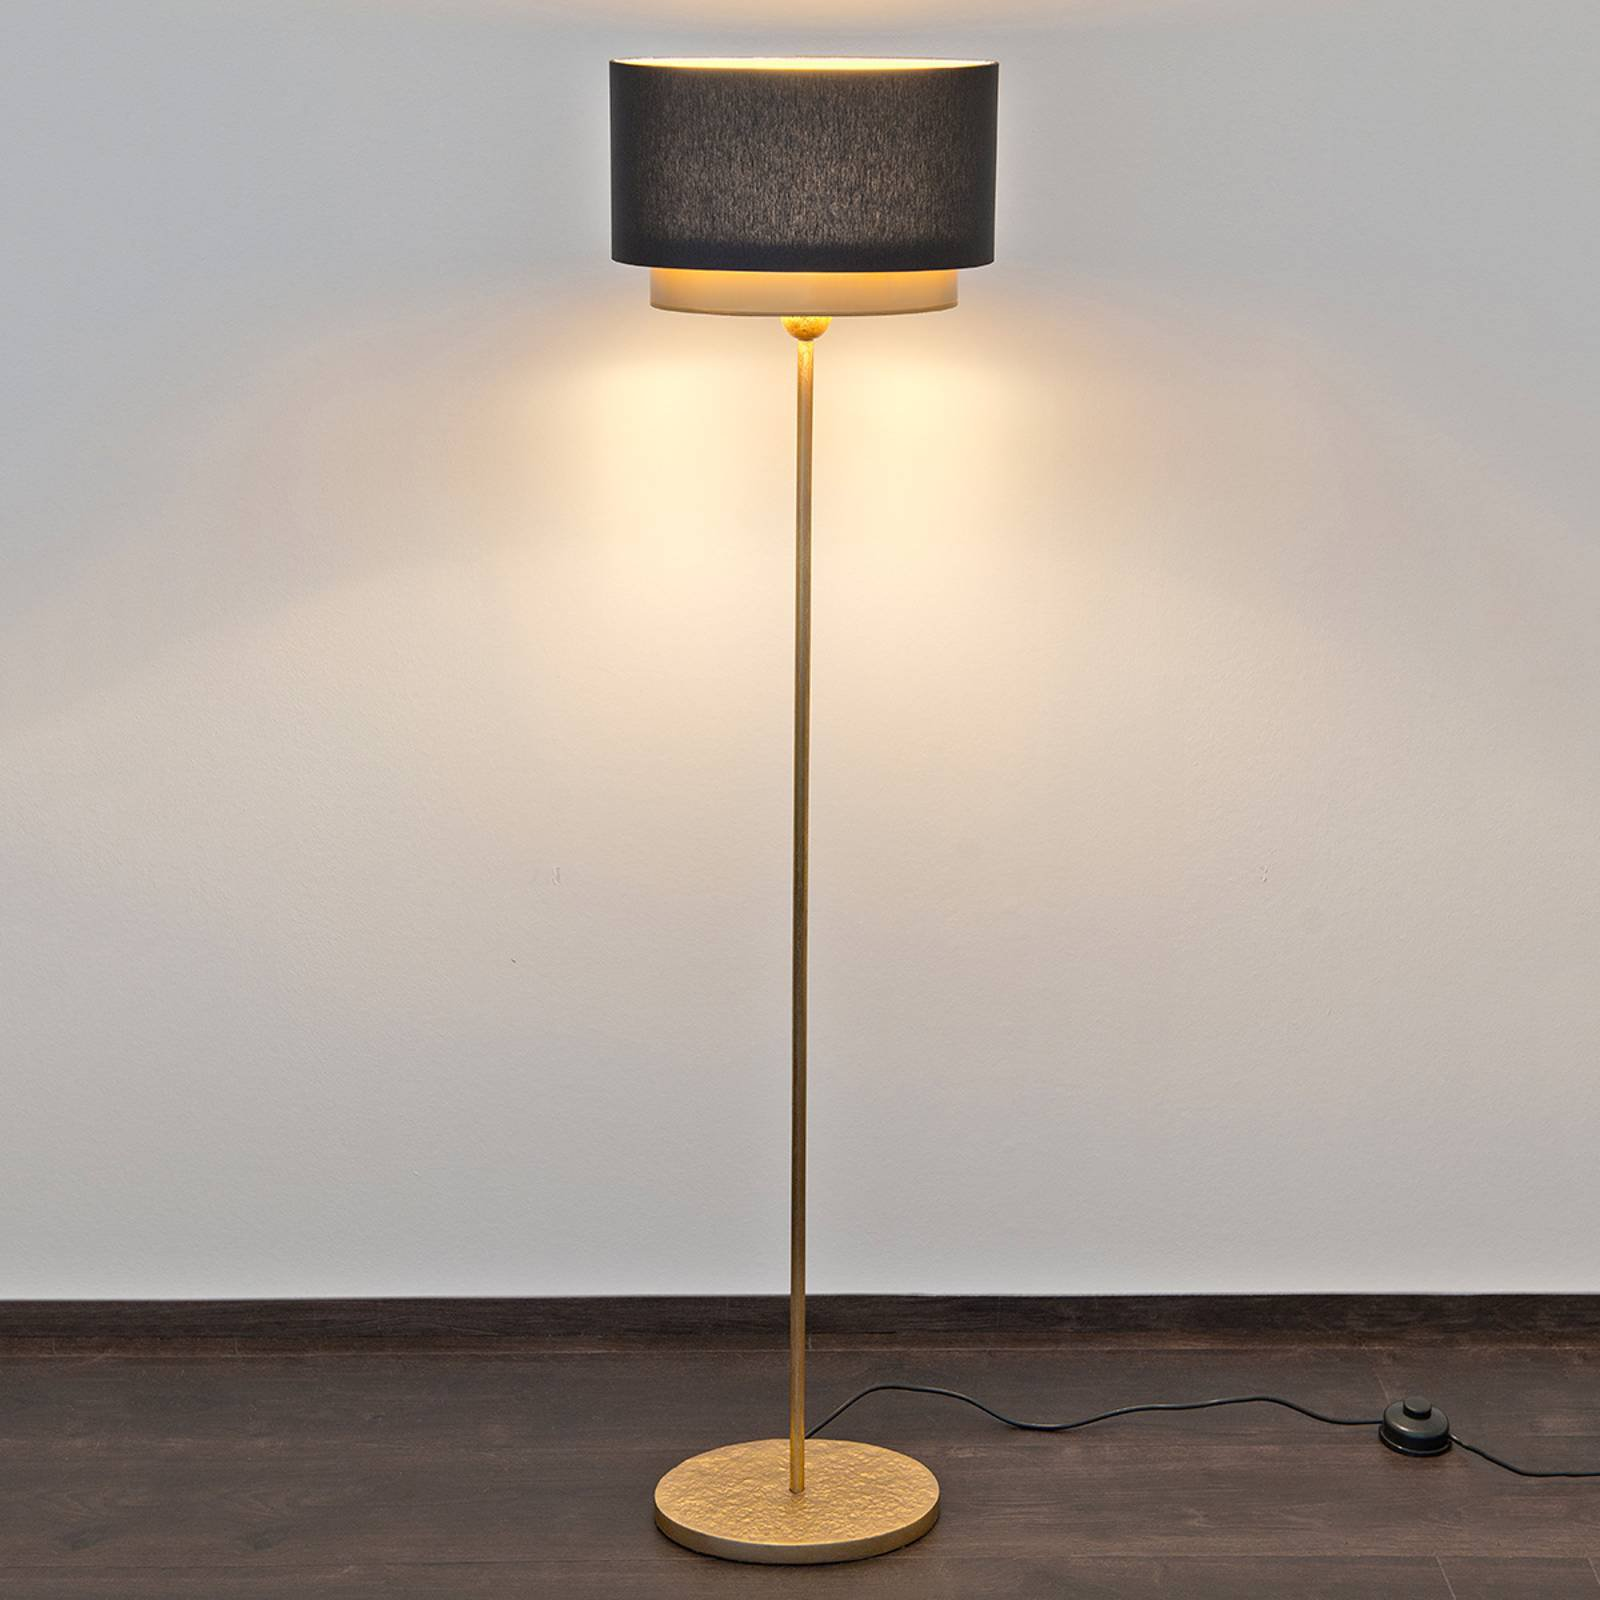 Mattia Oval - strålende gulvlampe